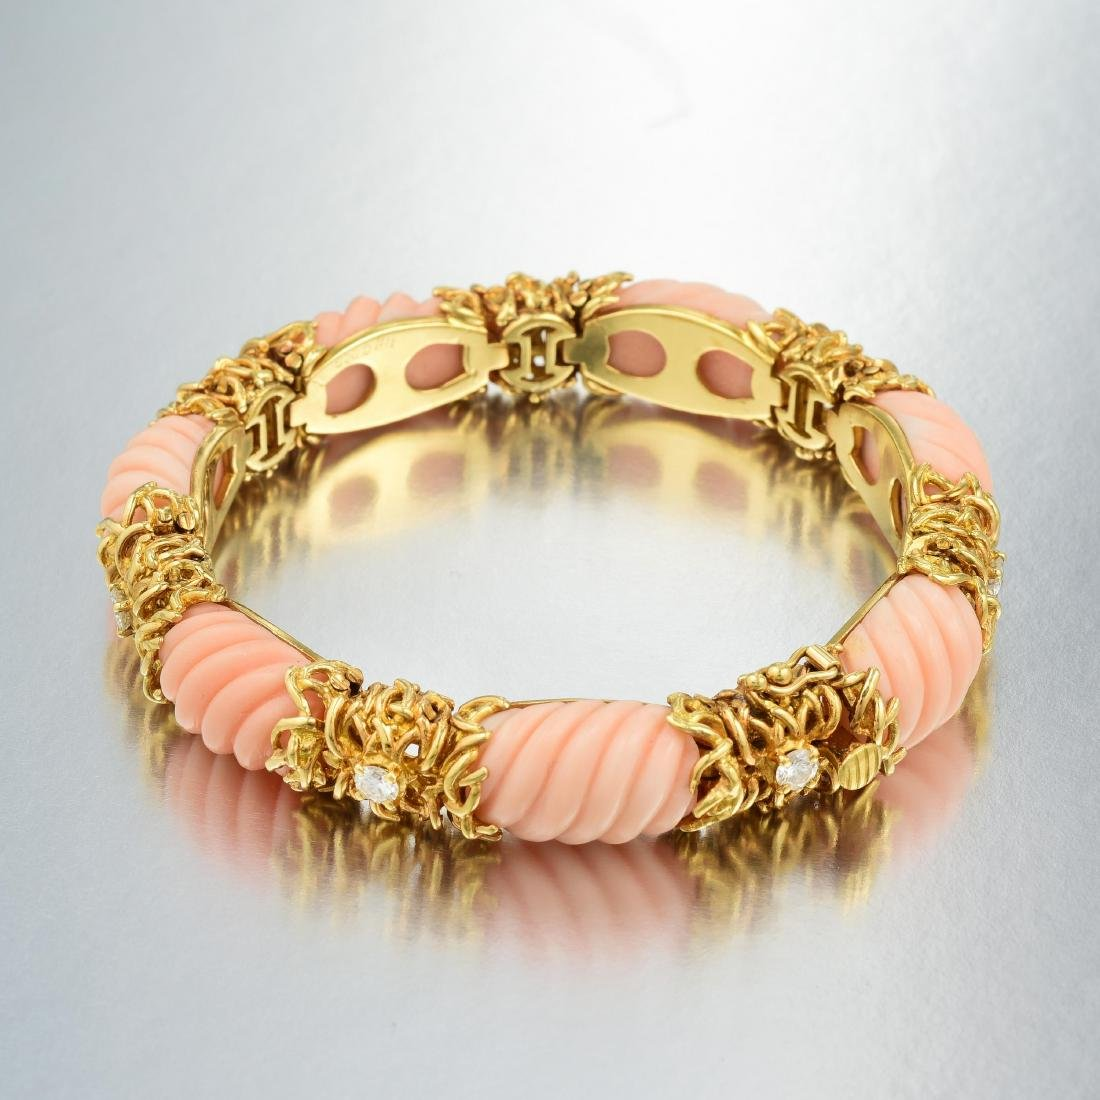 A Coral and Diamond Bracelet - 2